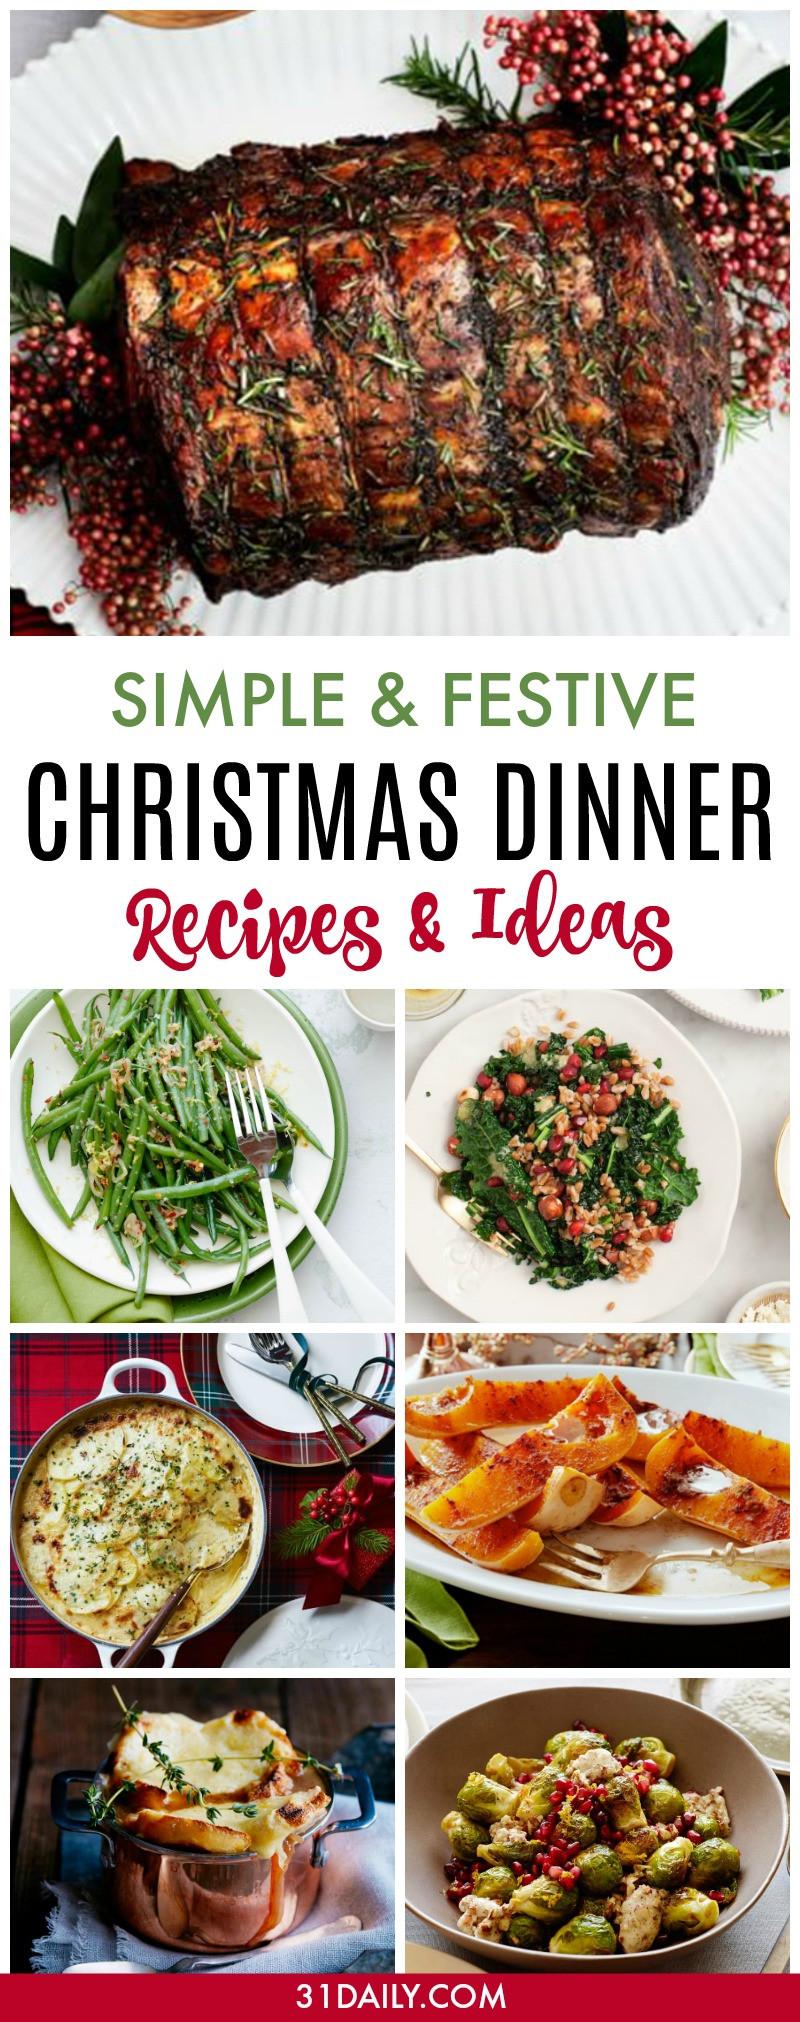 Simple Christmas Dinner  Simple and Festive Christmas Dinner Recipes and Ideas 31